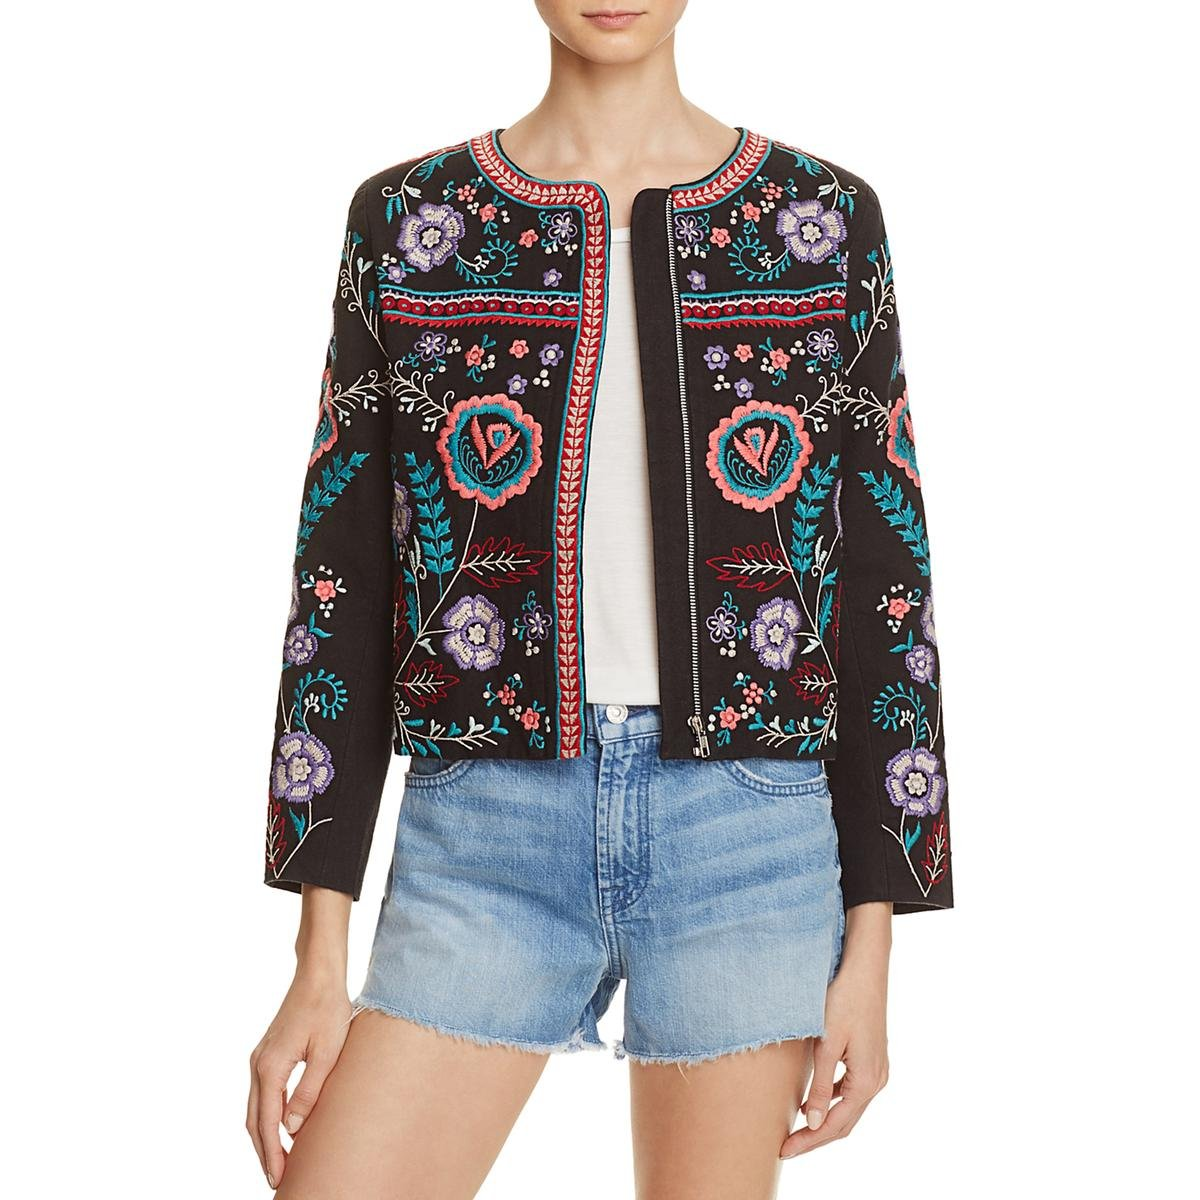 Parker Womens Halston Floral Embroidered Jacket Black M